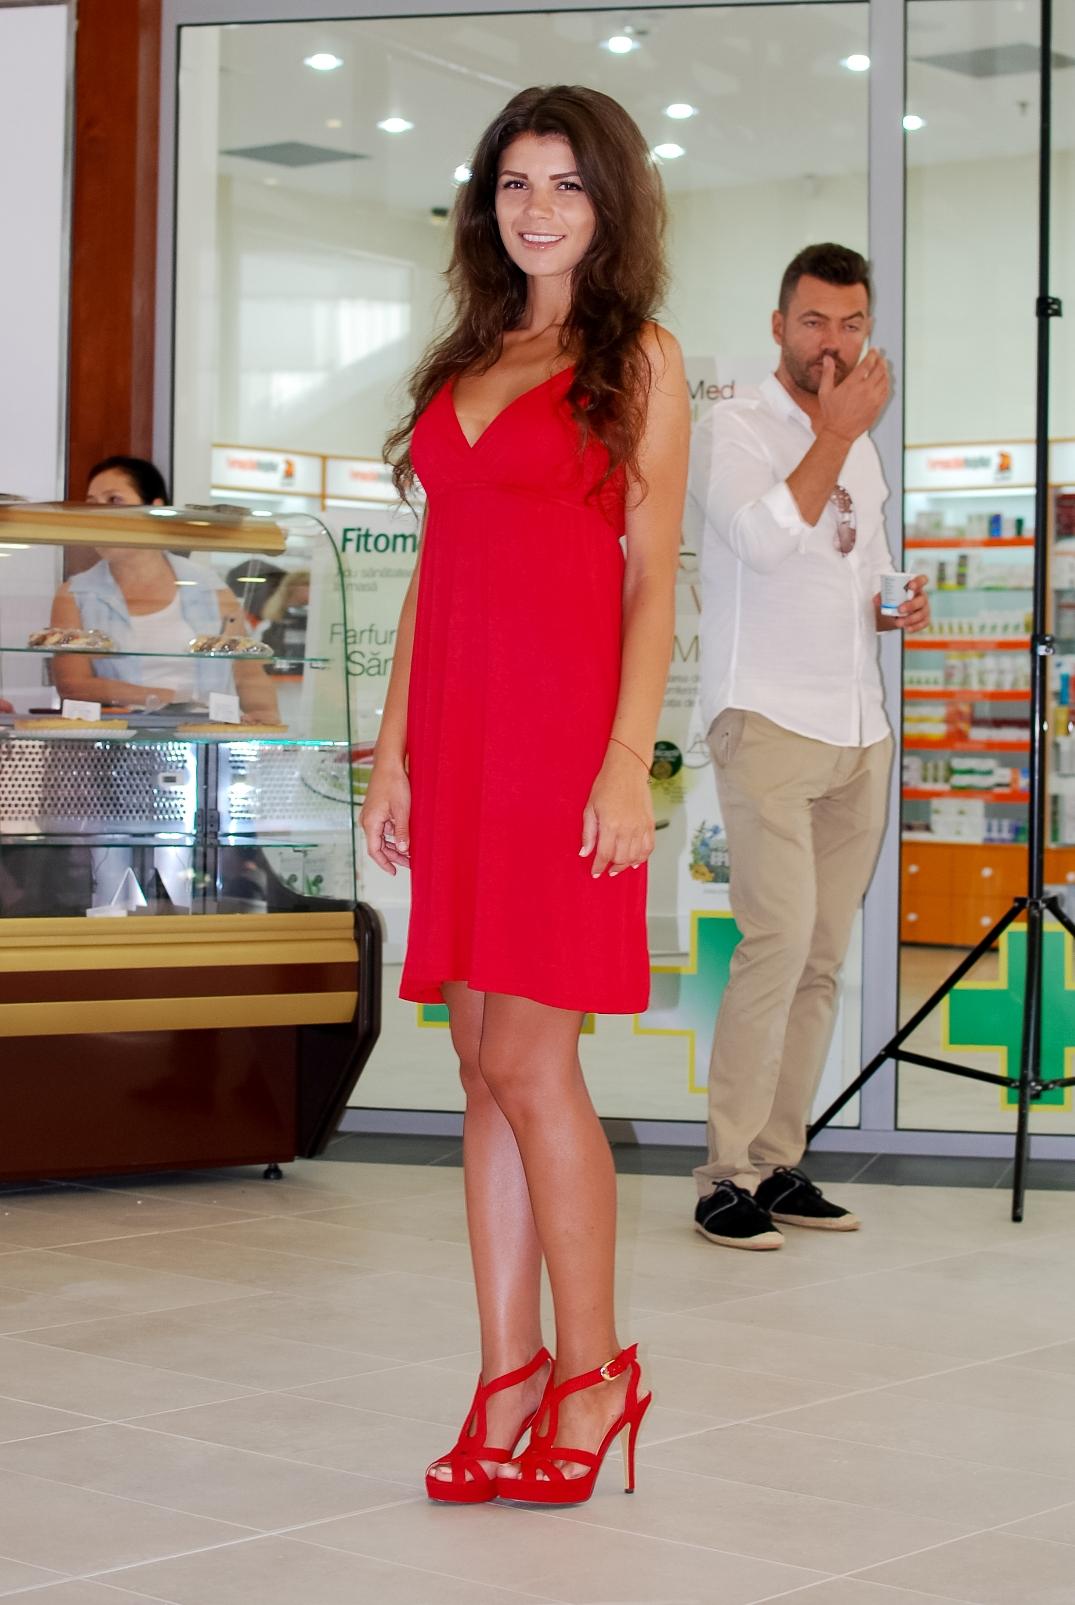 Hostess+Constanta+Inaugurare+Cora+(3).JPG